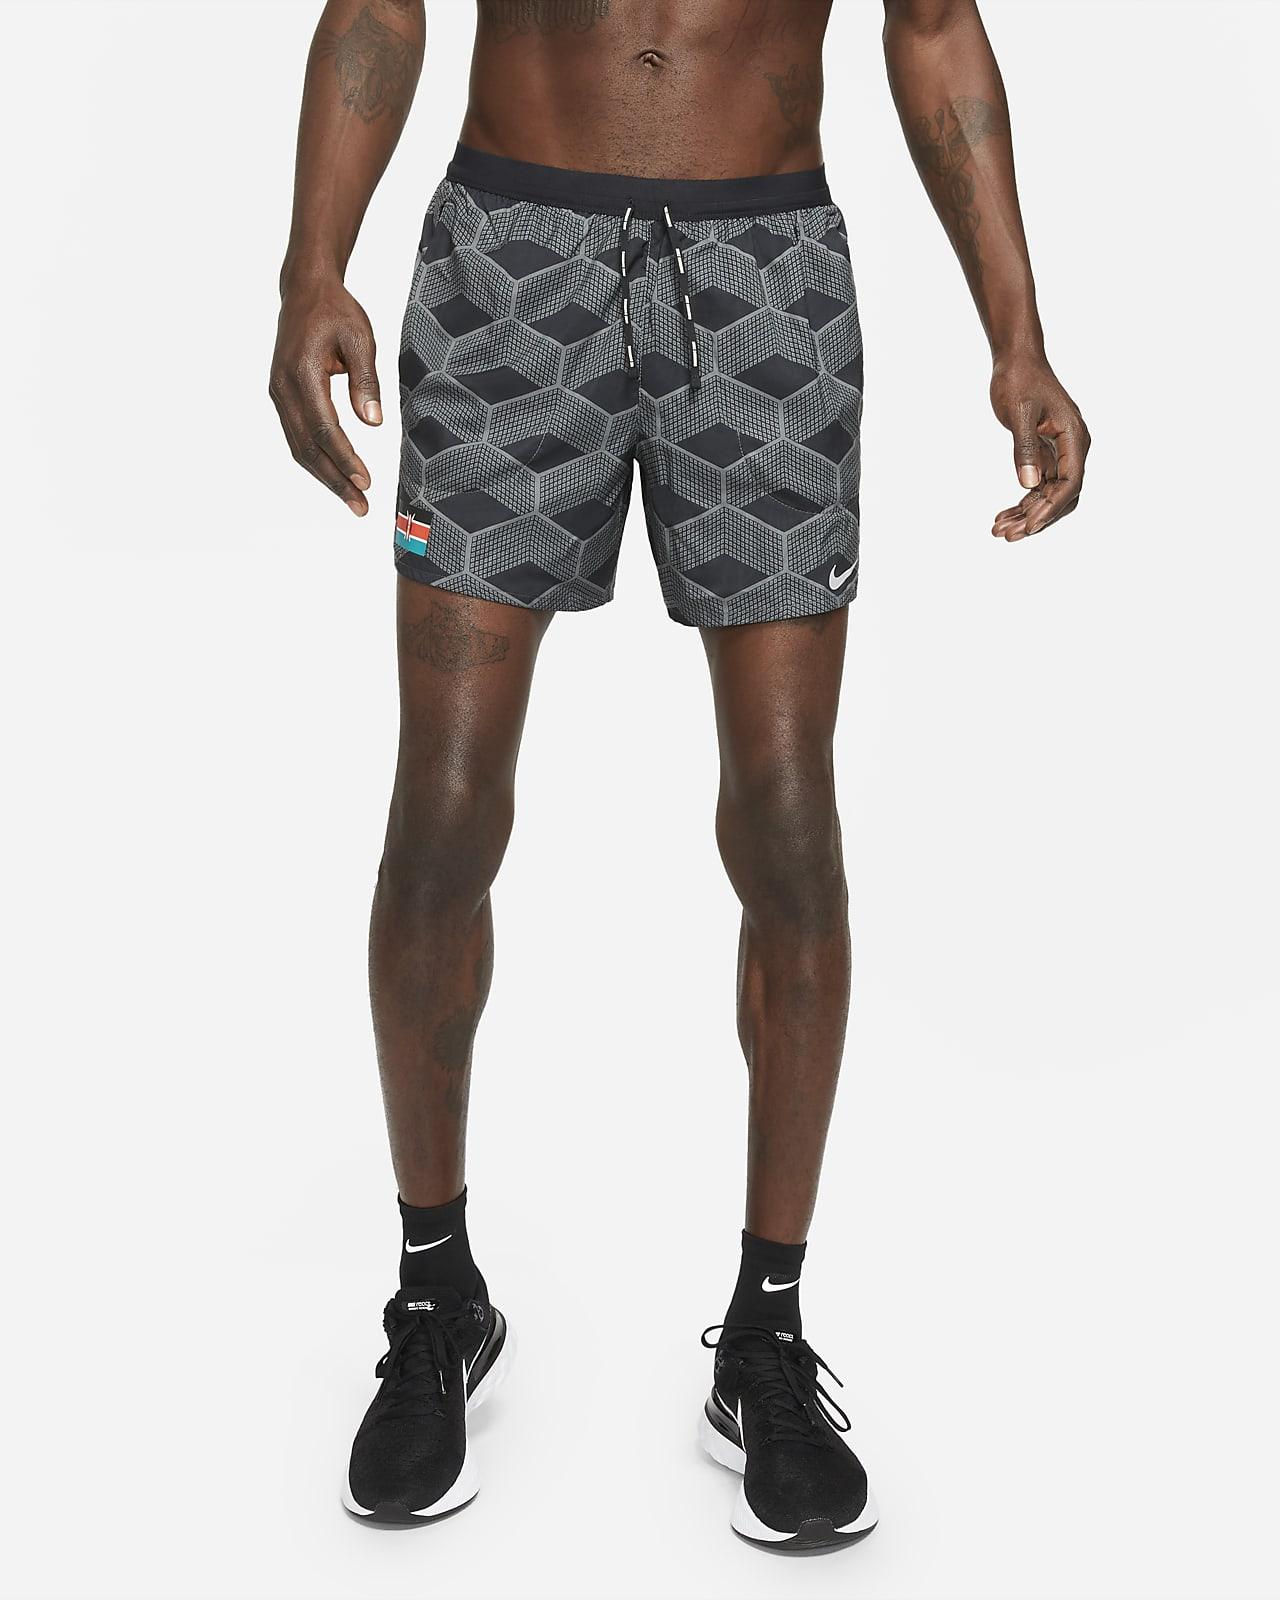 Nike Dri-FIT Team Kenya Flex Stride Men's Running Shorts